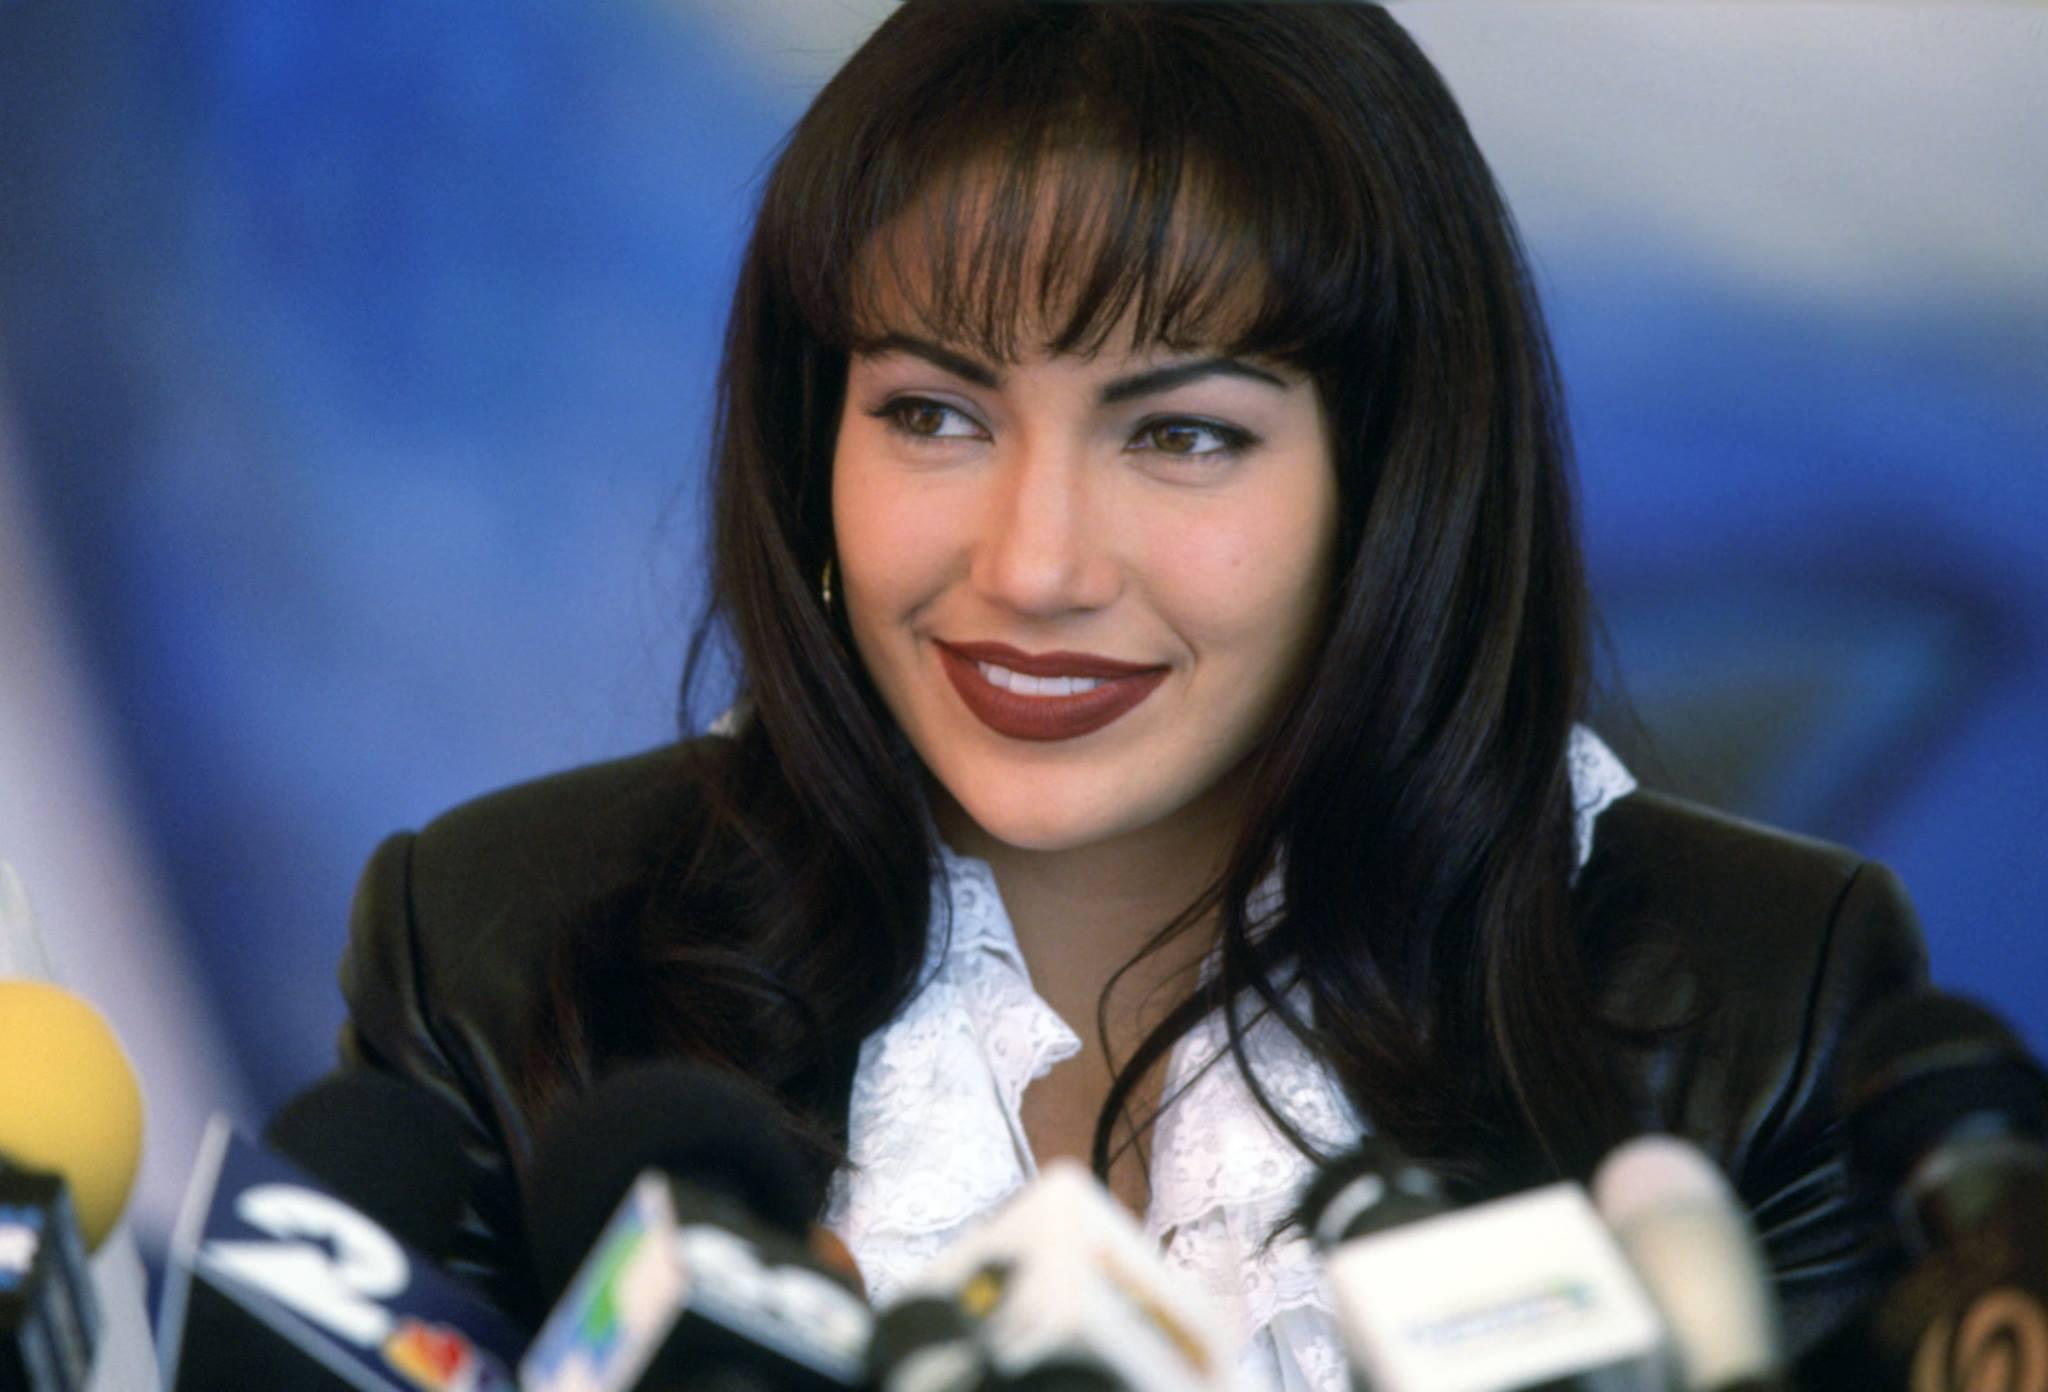 Newly Restored Version of Gregory Nava's 'Selena' Hits the Big Screen